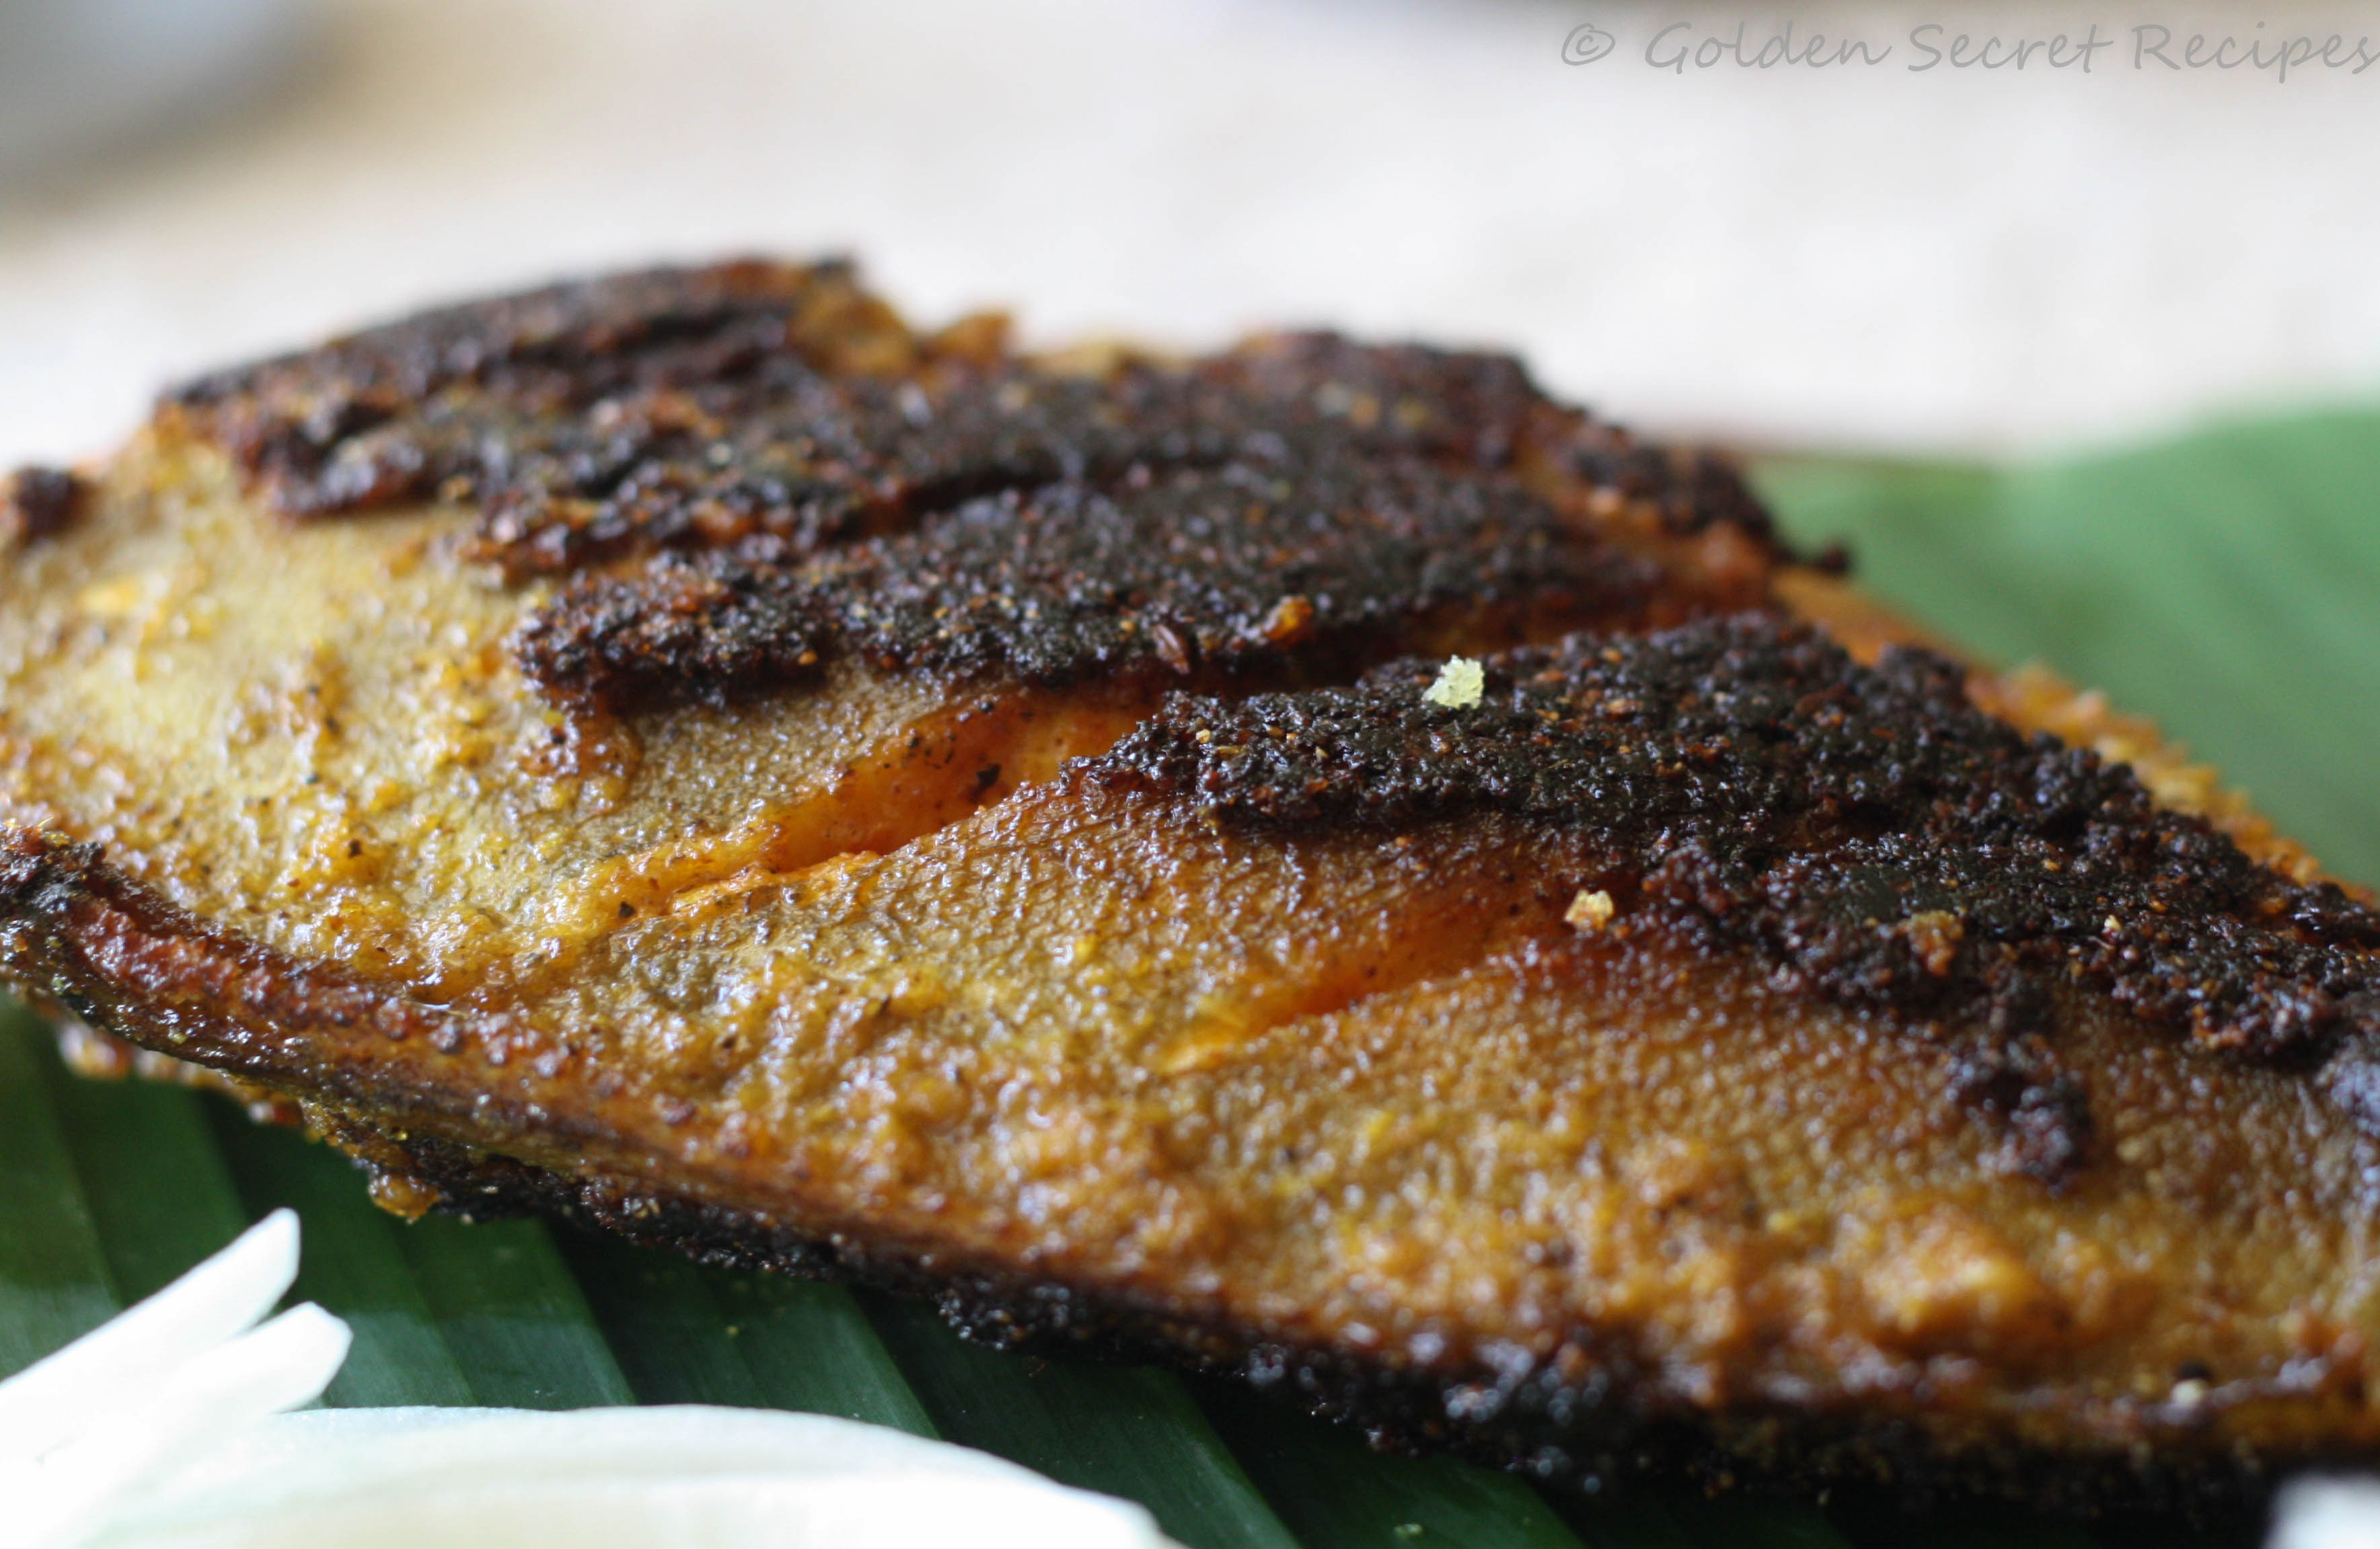 Kerala fish fry golden secret recipes for Fish fry in my area